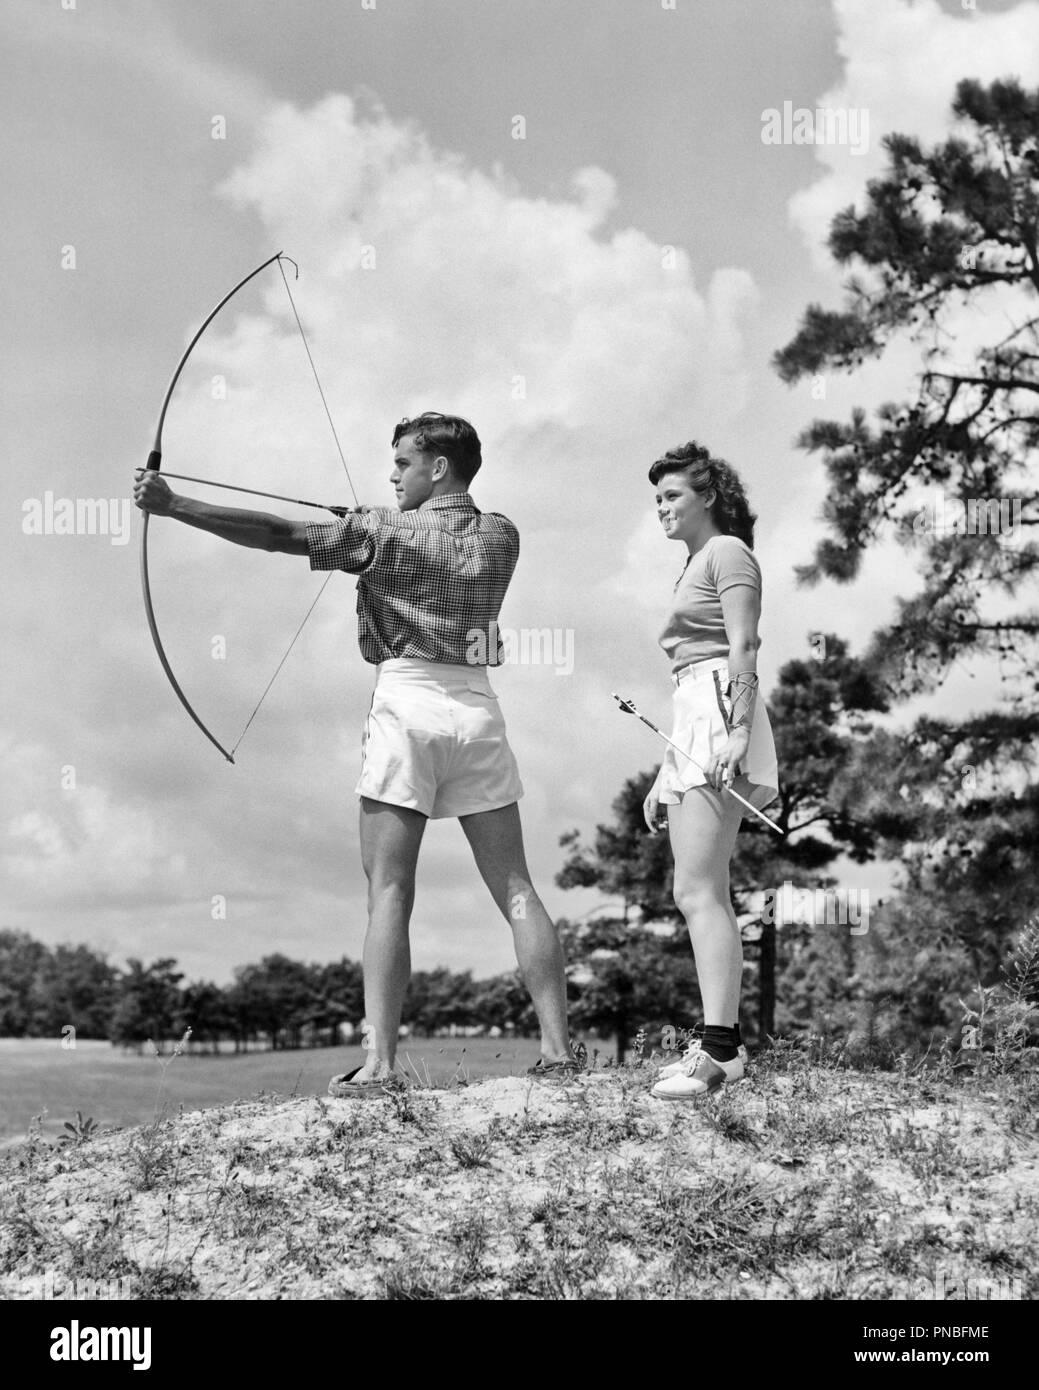 3bd415a1b852 1930s TEENAGE COUPLE PRACTICING ARCHERY SHOOTING BOW AND ARROW - a941  HAR001 HARS JOY LIFESTYLE RURAL